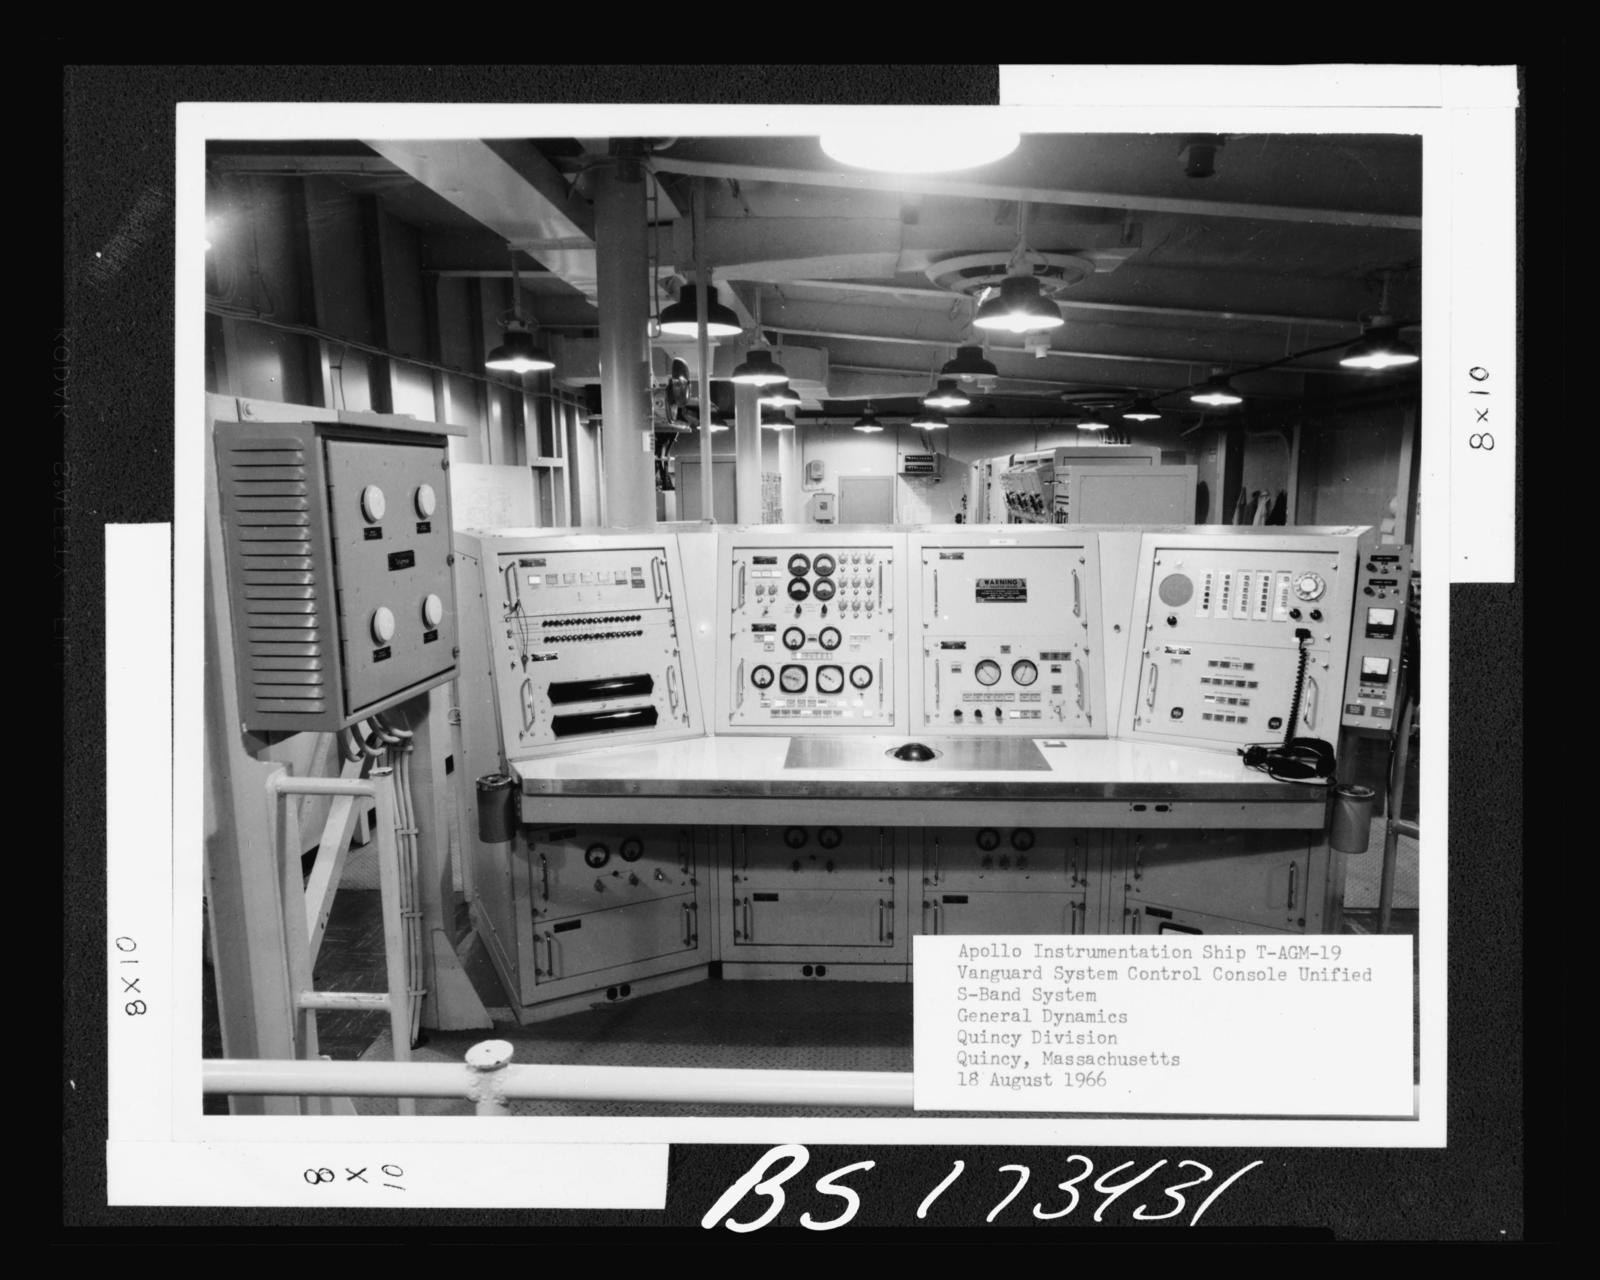 AGM-19 Mission San Fernando - U S  National Archives Public Domain Image